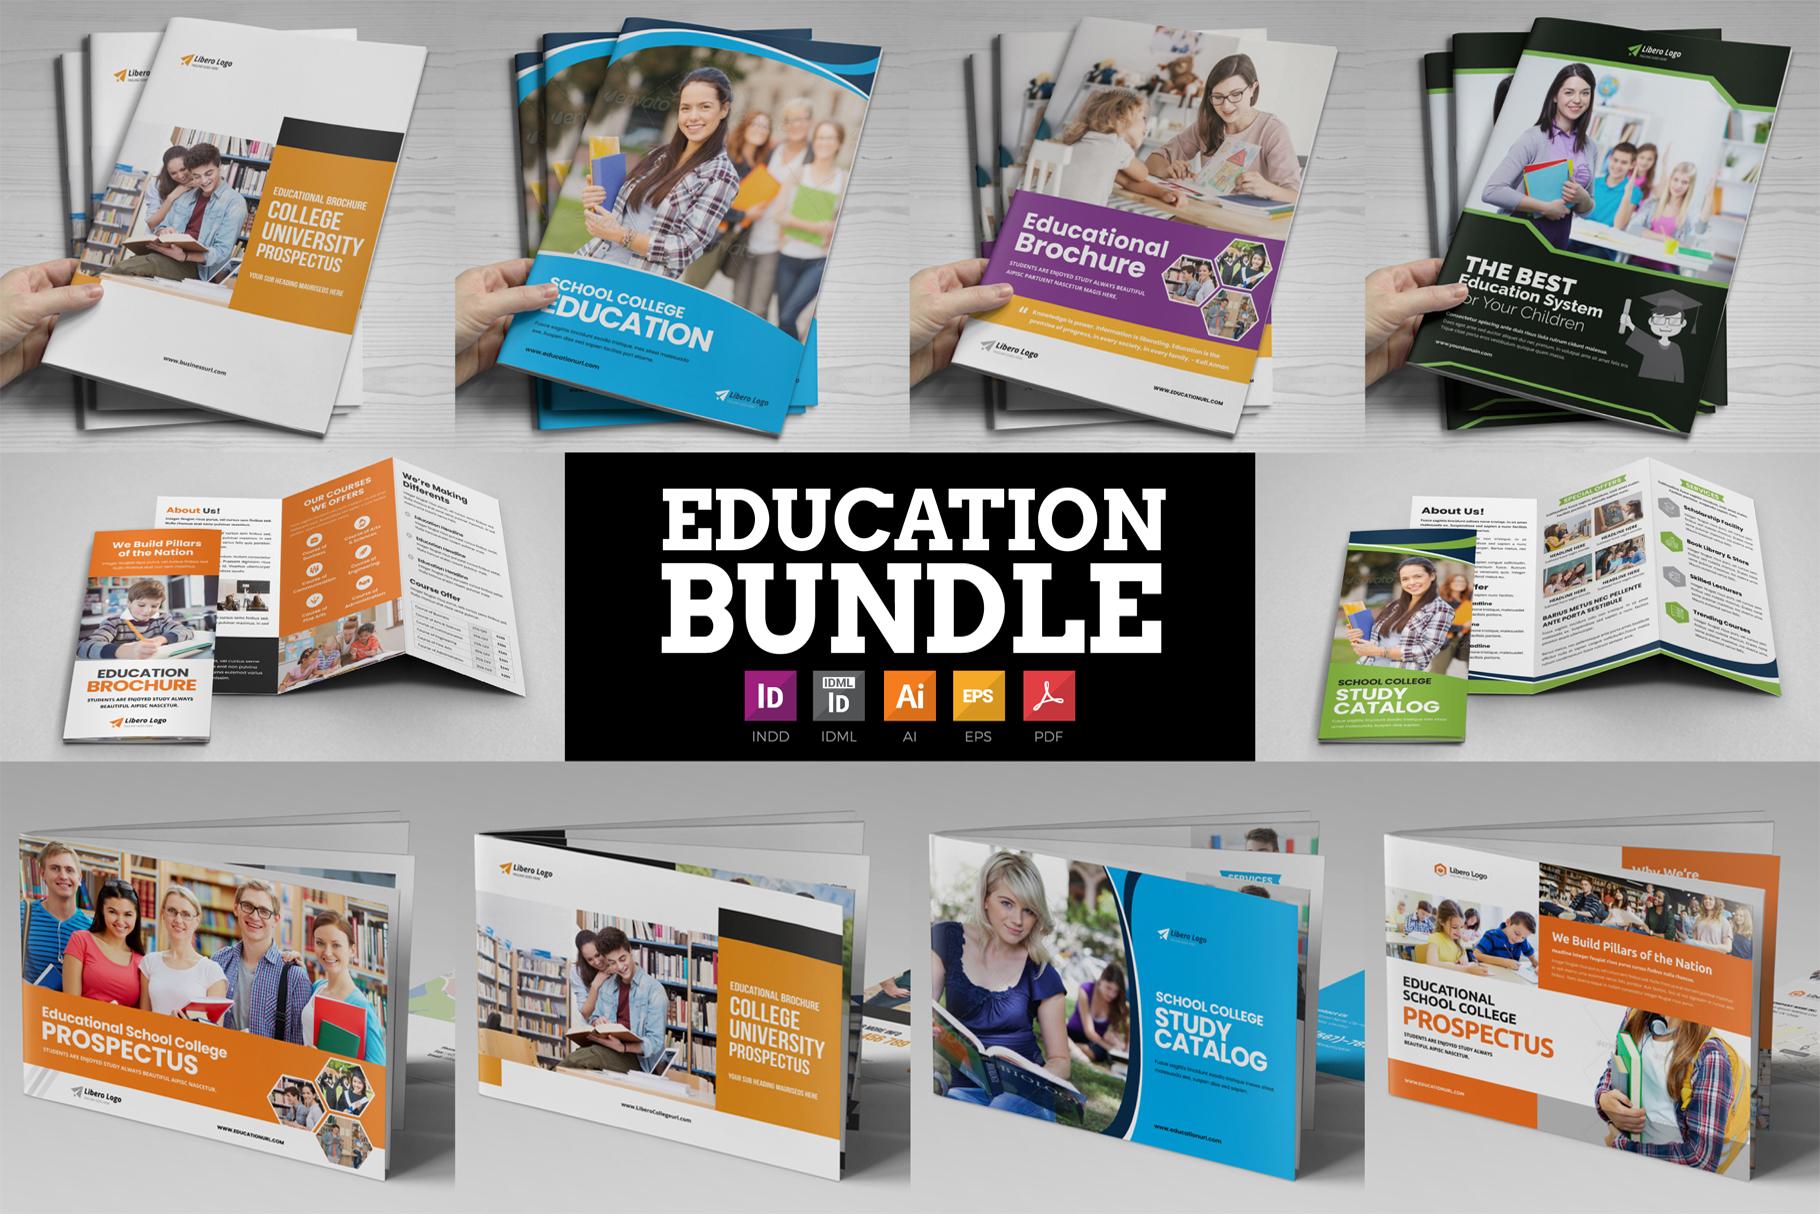 Education Brochure Bundle v2 example image 1